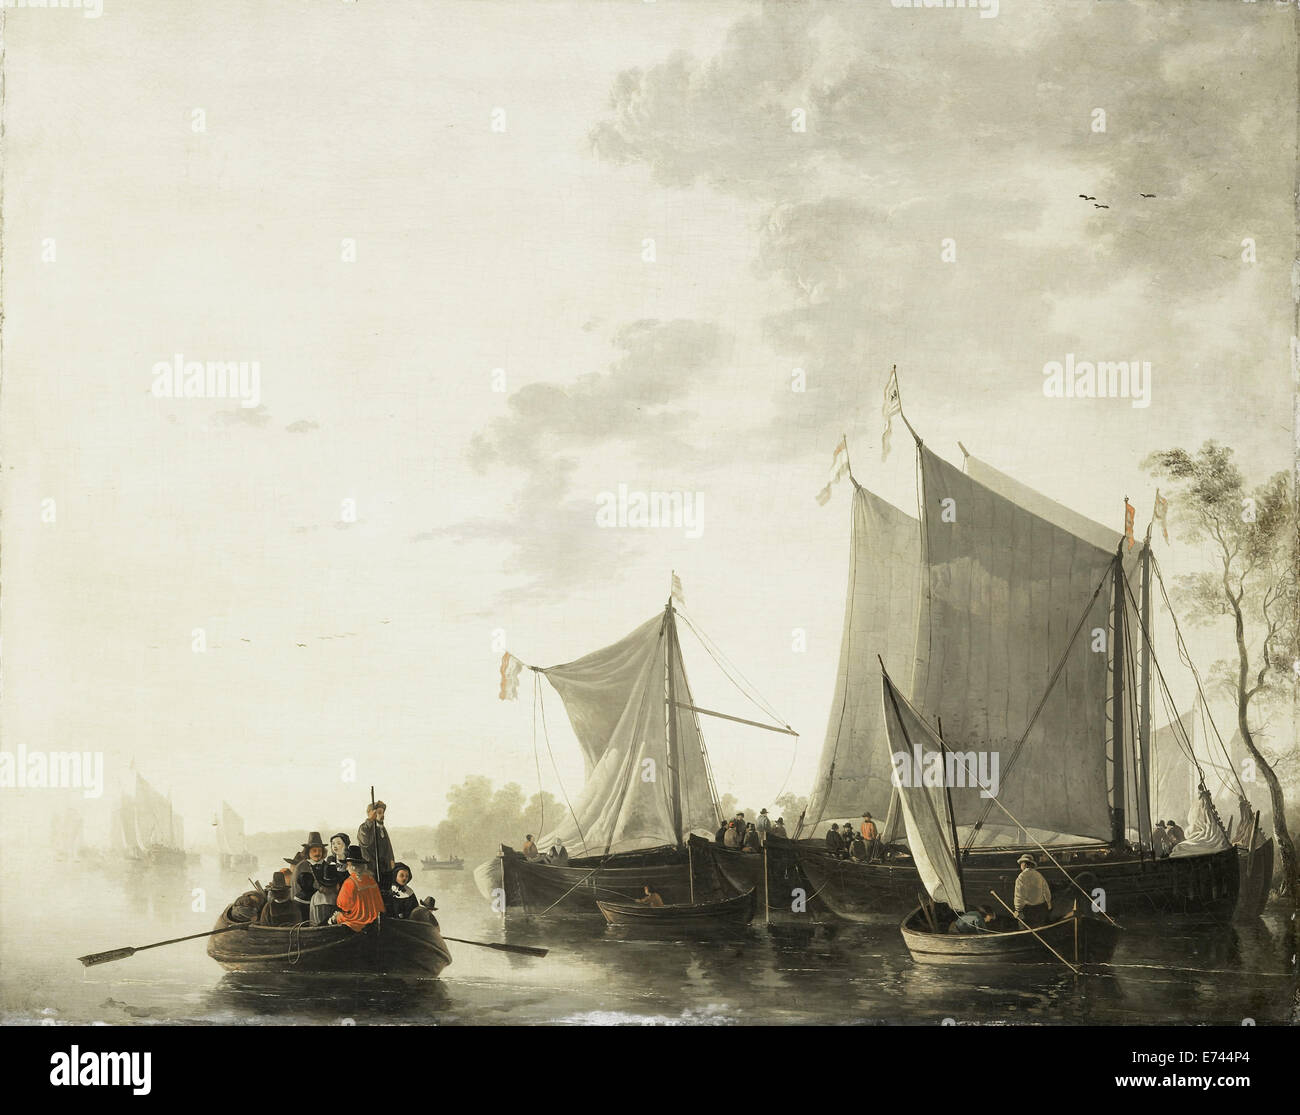 Rivier scene - by Albertus Brondgeest, 1815 - 1849 - Stock Image